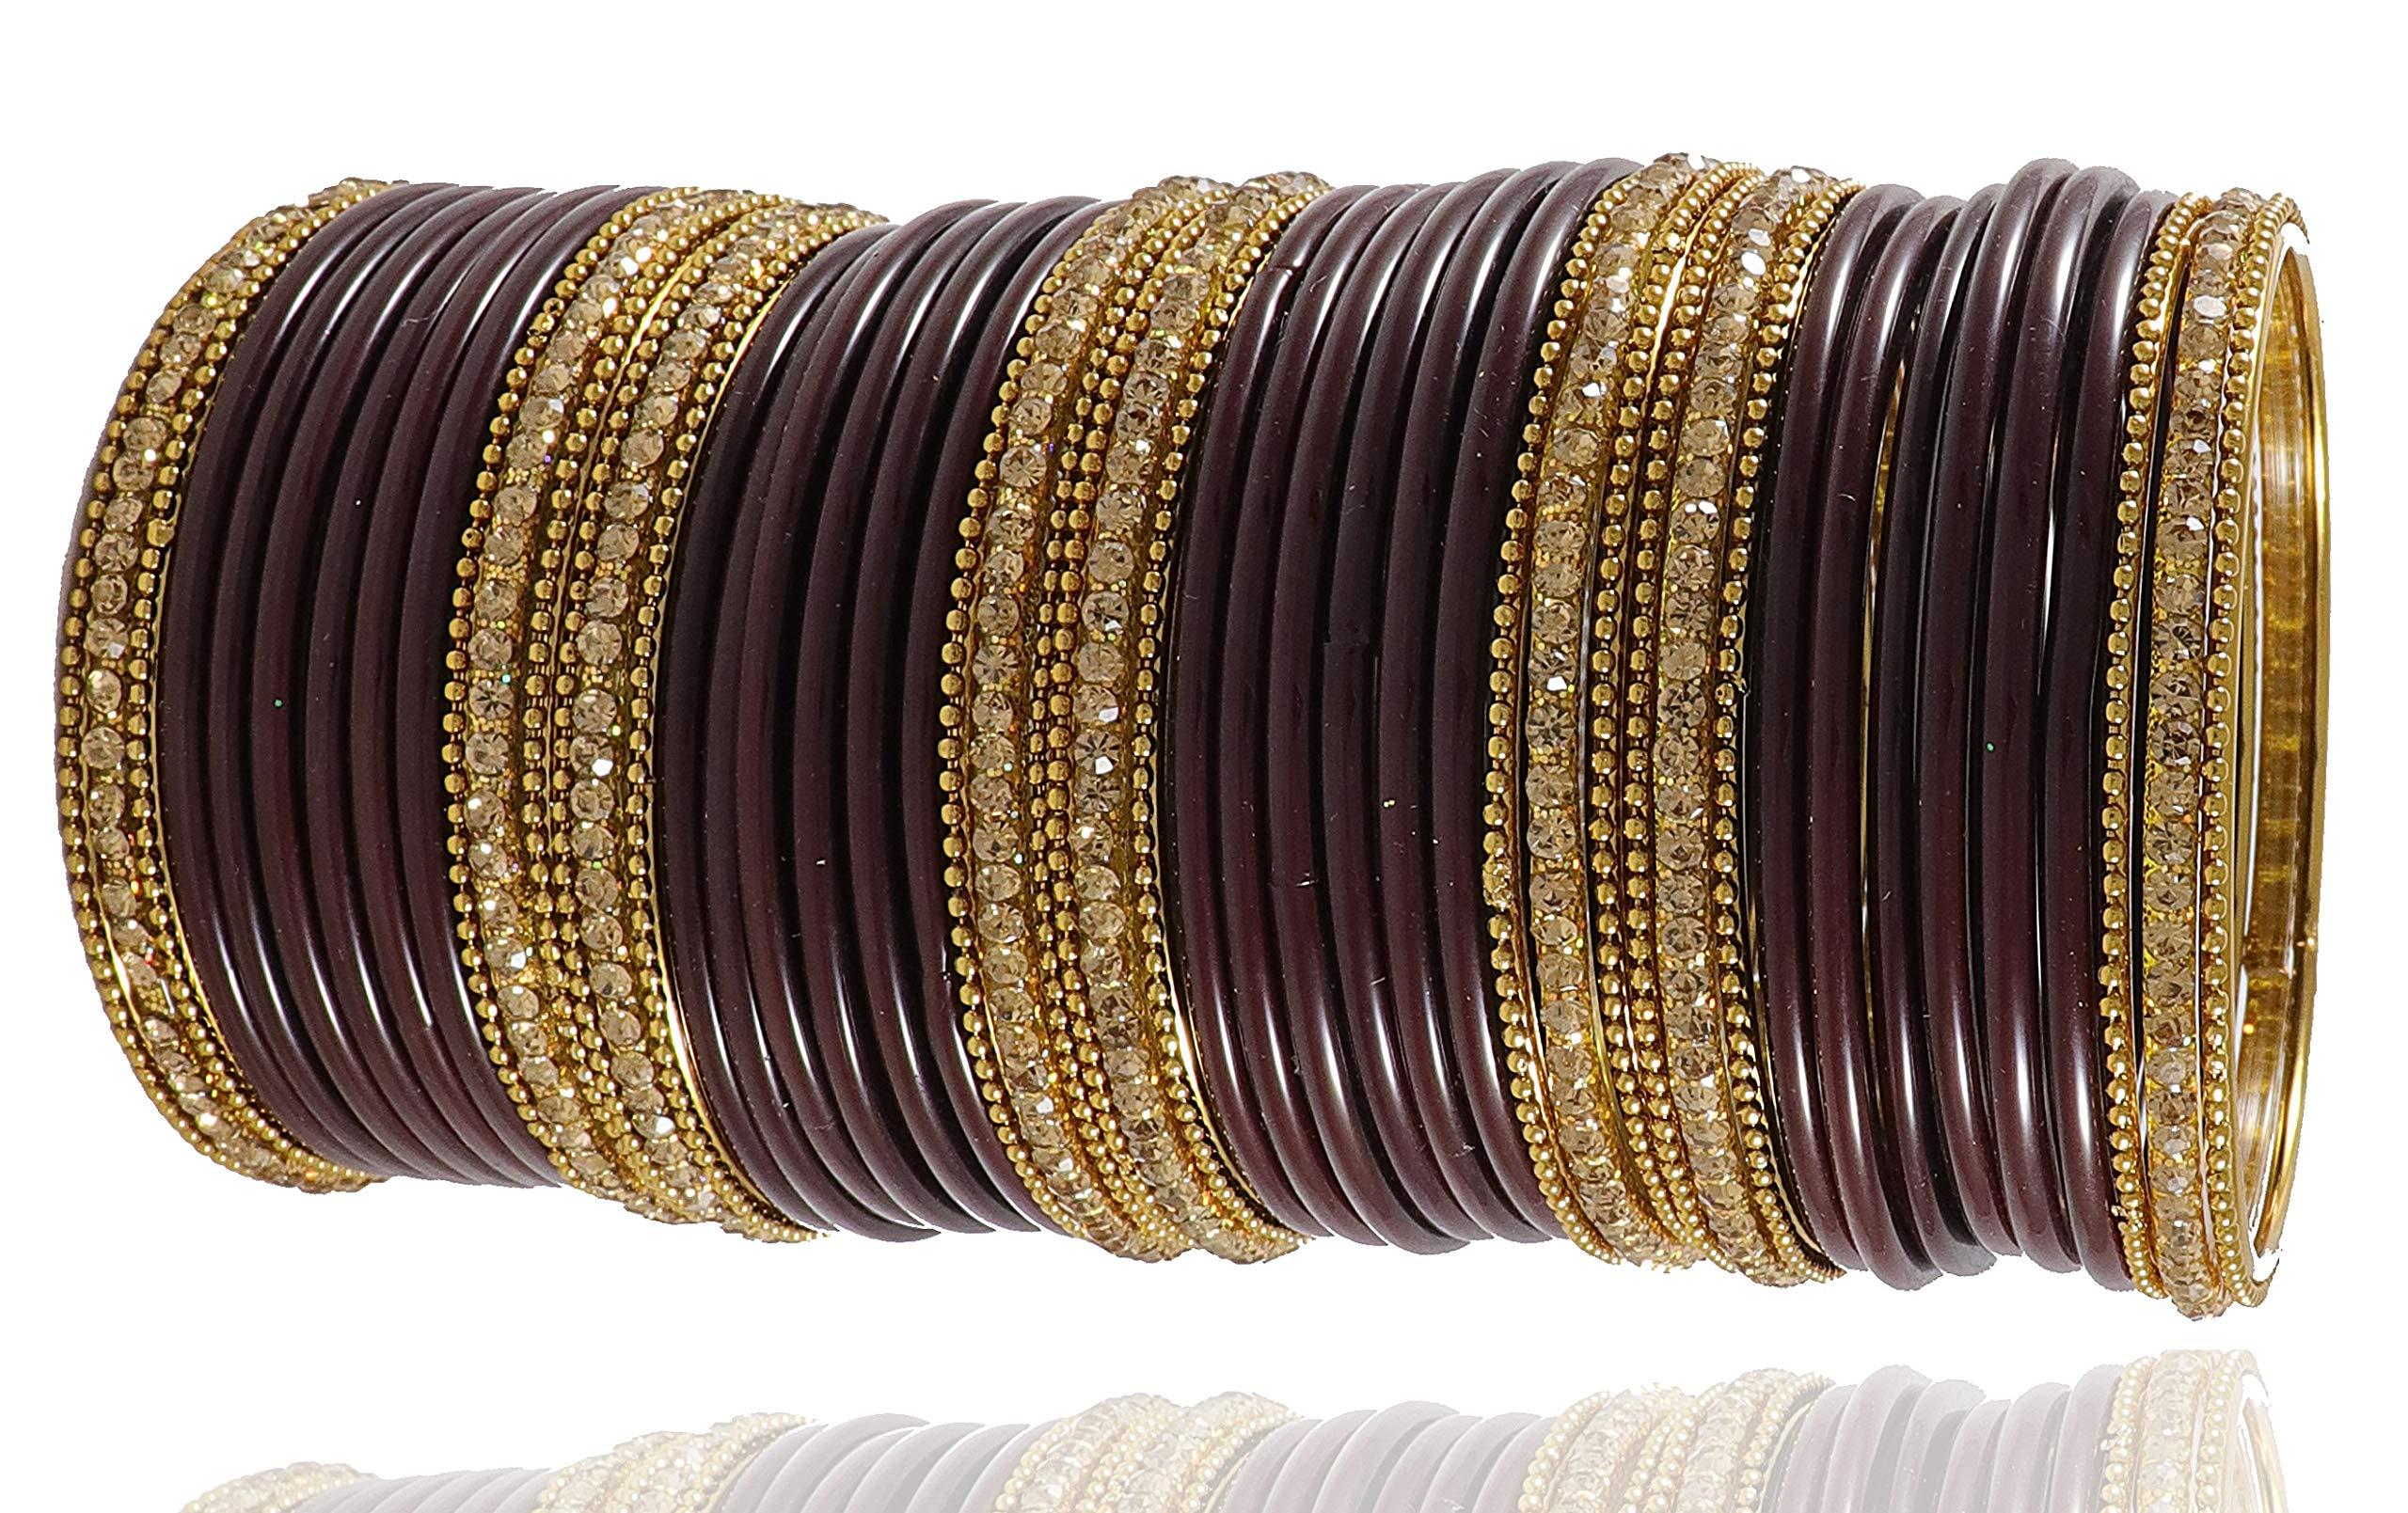 NMII Beautiful & Glossy Plain Glass Bangles Set Studded with Zircon for Women & Girls (Brown, 2.8) (B07GP6S1QM) Amazon Price History, Amazon Price Tracker